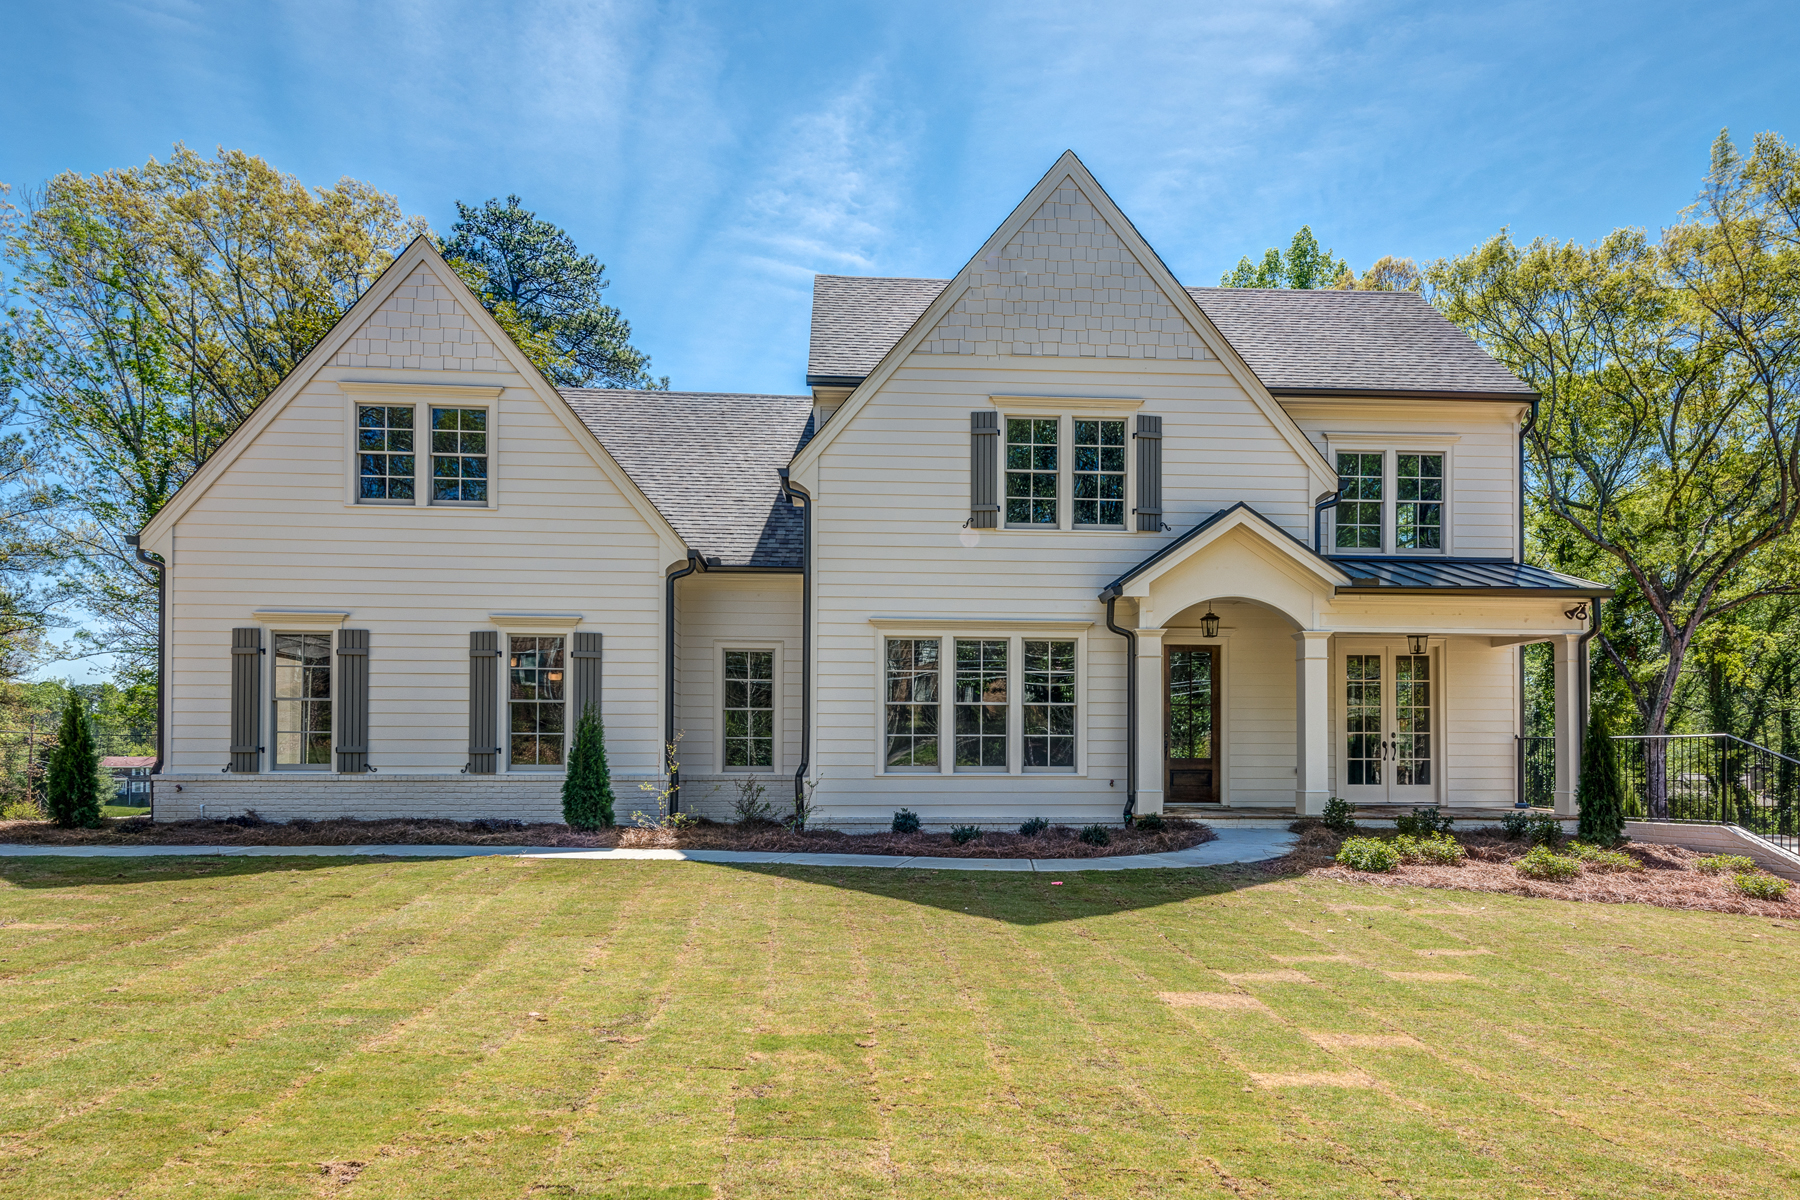 独户住宅 为 销售 在 Beautiful Harrison Designed New Construction 775 Sudbury Road 桑迪, 乔治亚州, 30328 美国